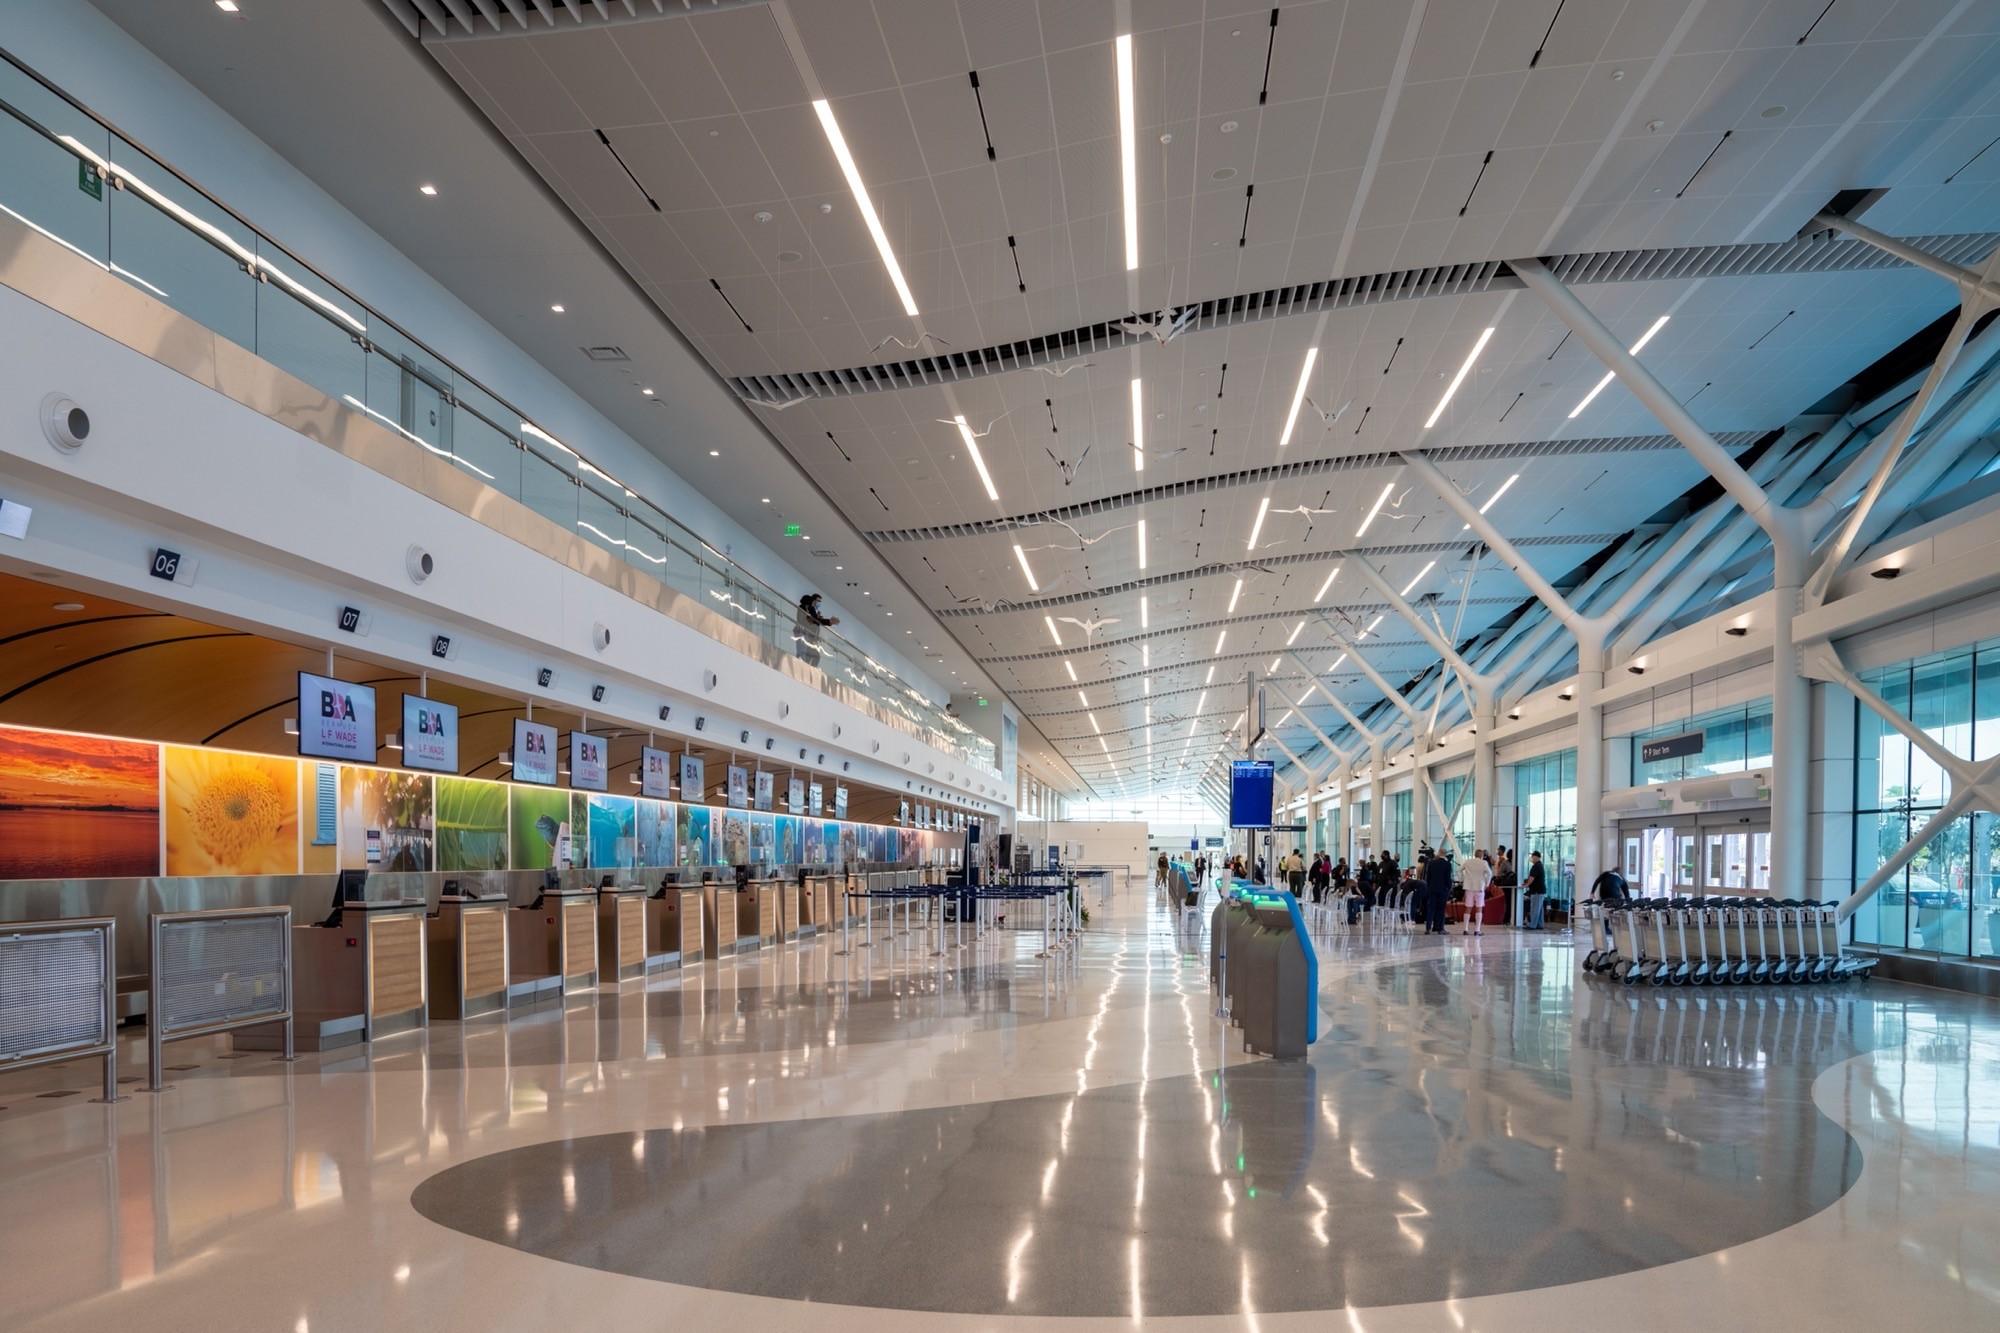 Bermuda Airport Opening Photo - interior